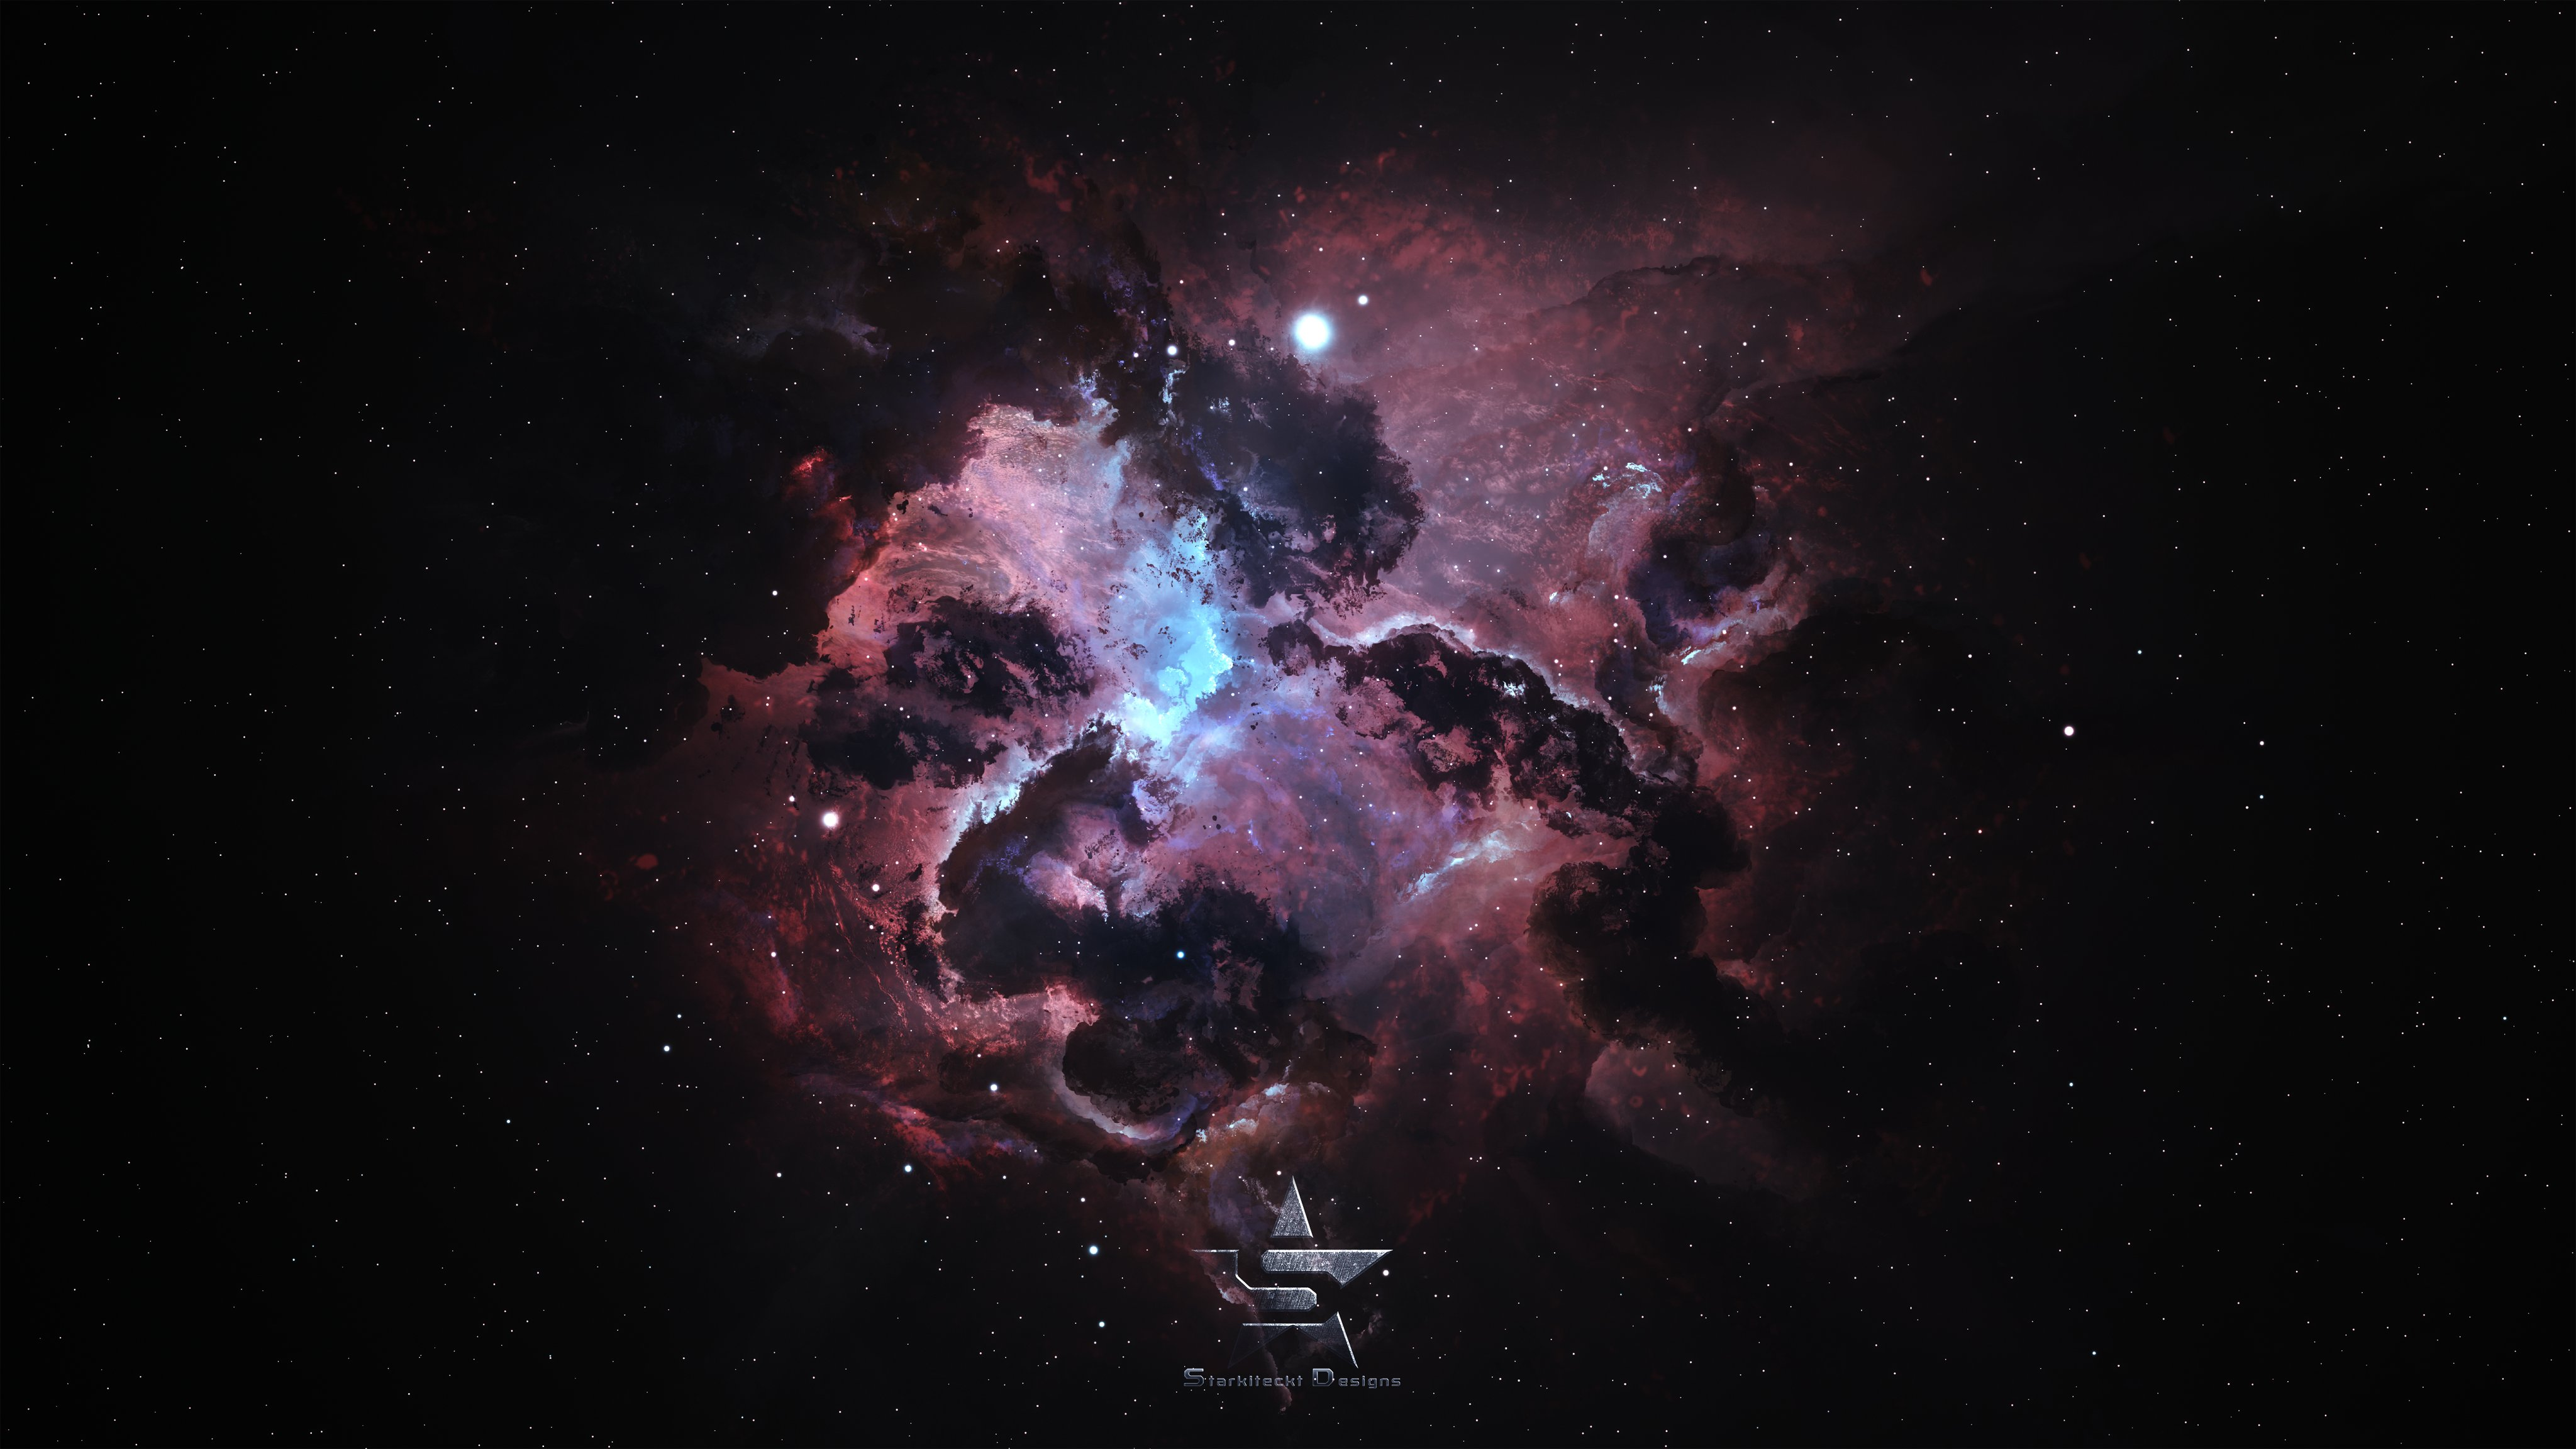 Starkiteckt atlantis nexus nebula 4k resolution 4k wallpaper - 4k resolution space wallpaper ...